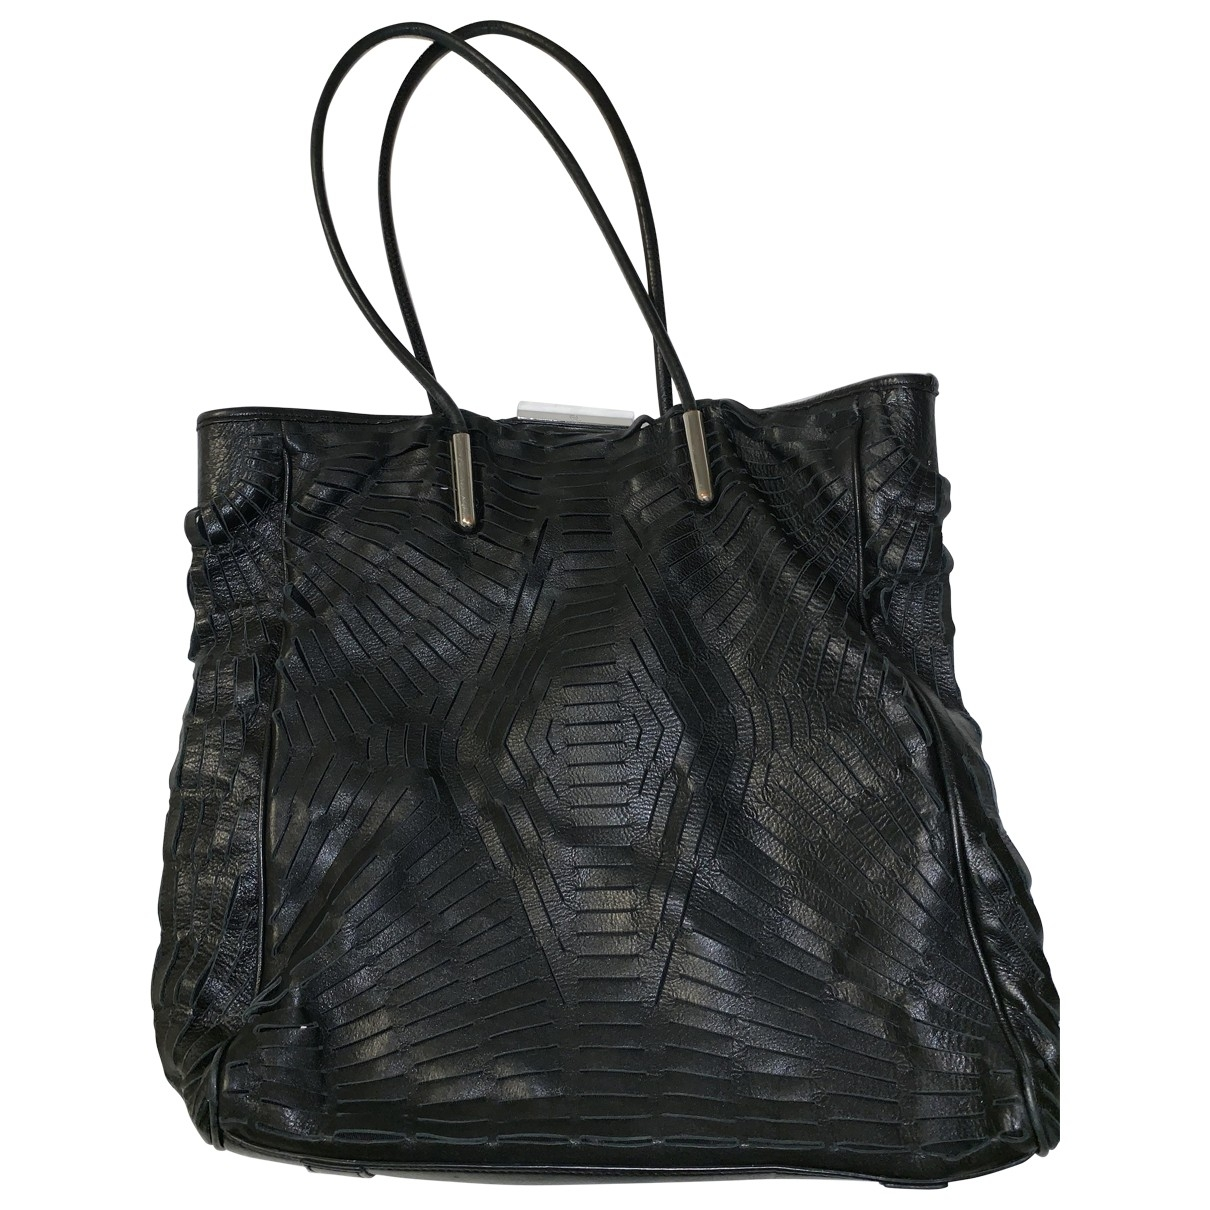 Mcq \N Black Leather handbag for Women \N